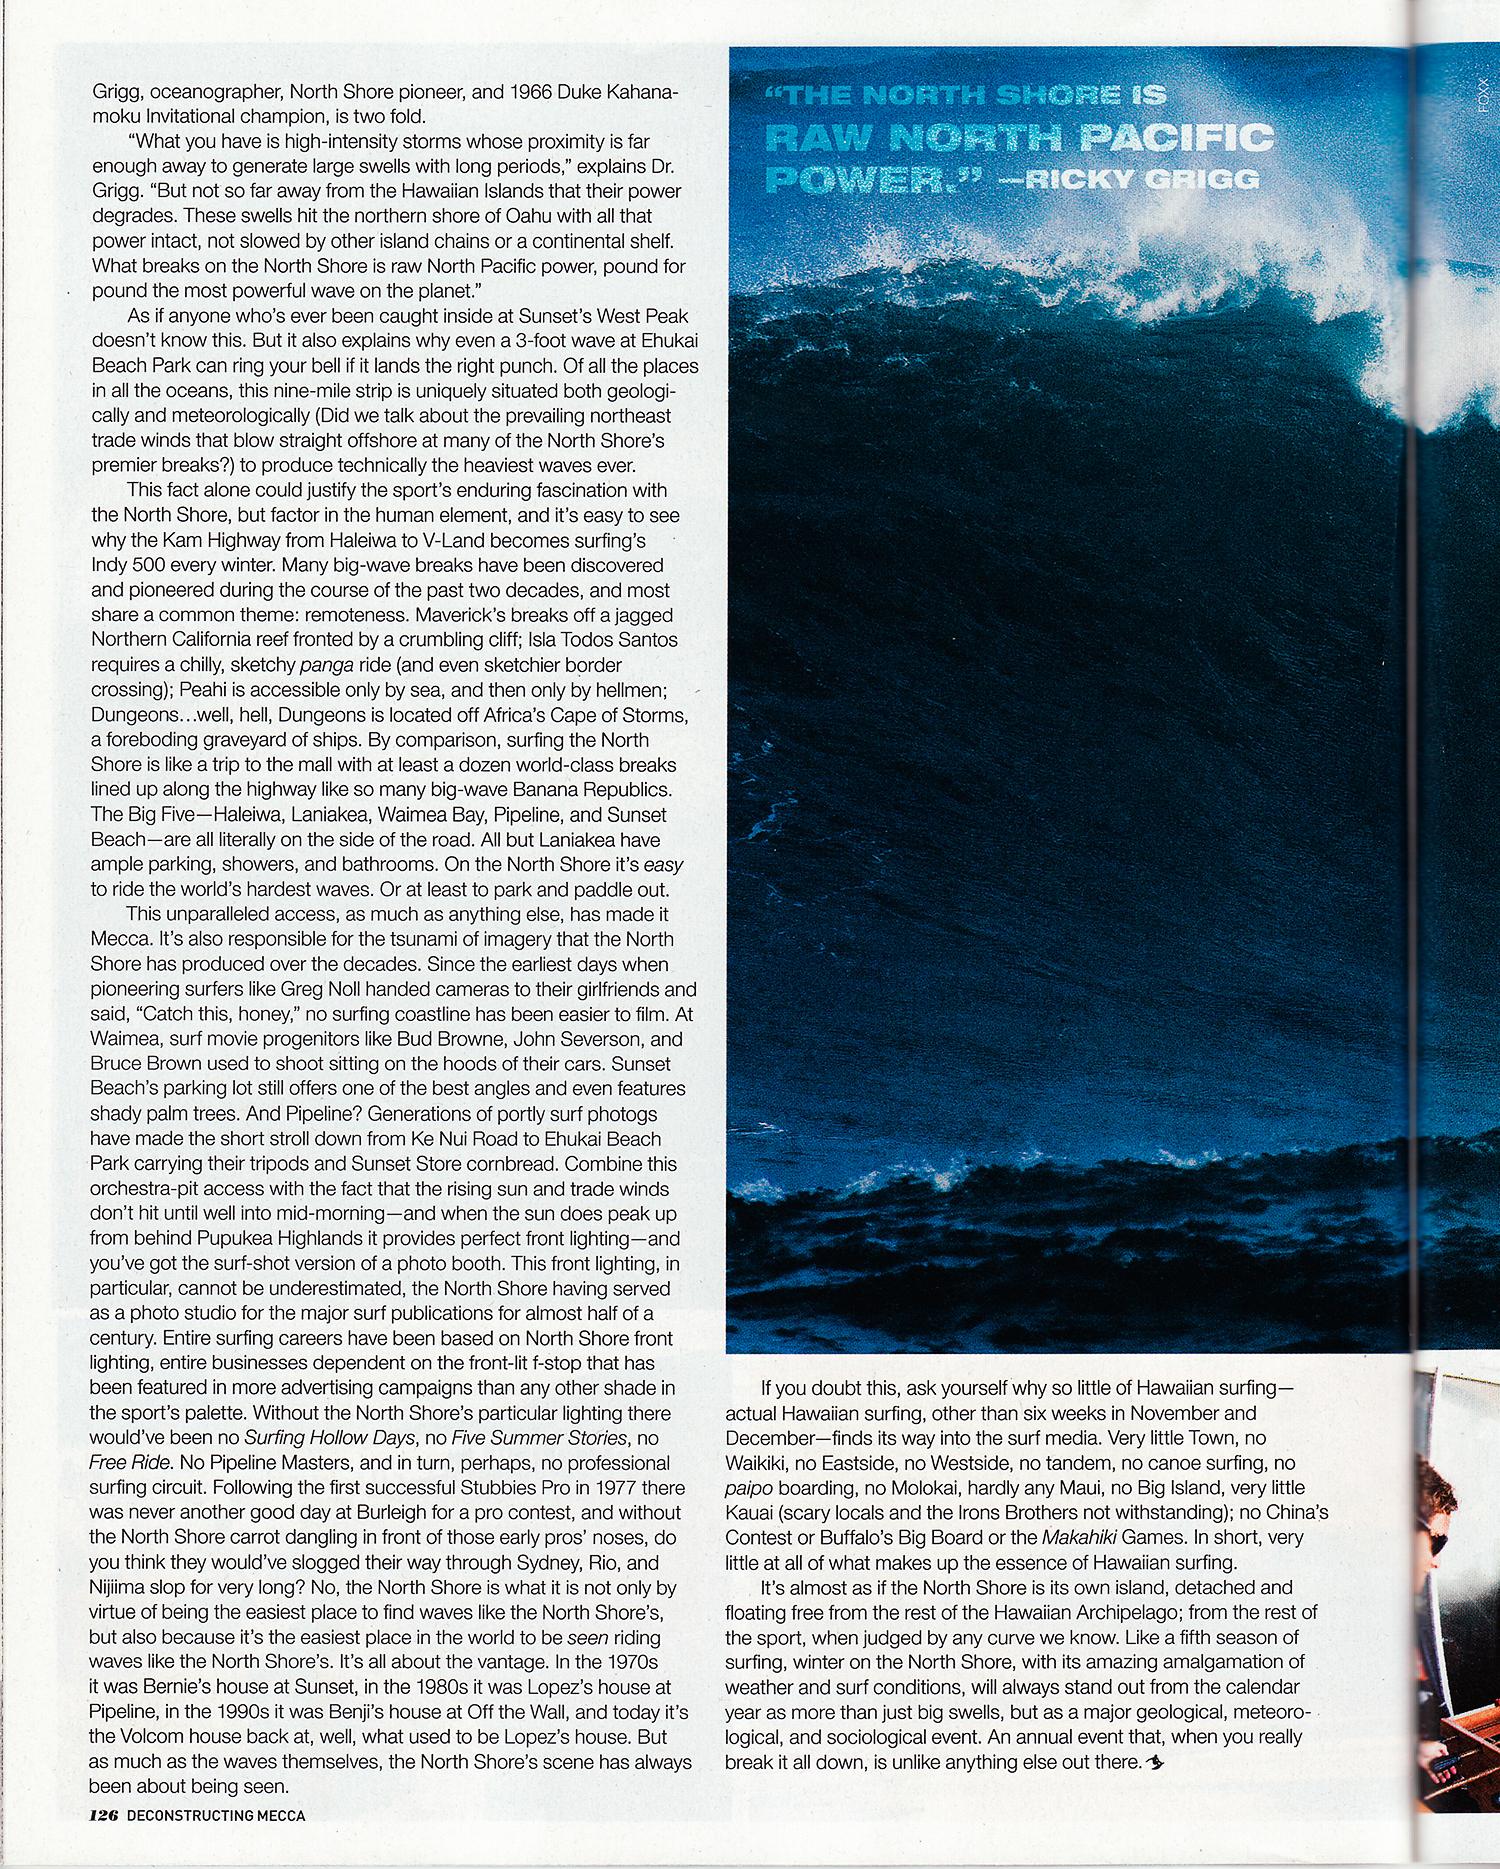 2008-04_Surfer-Inhalt04_A4-300dpi.jpg